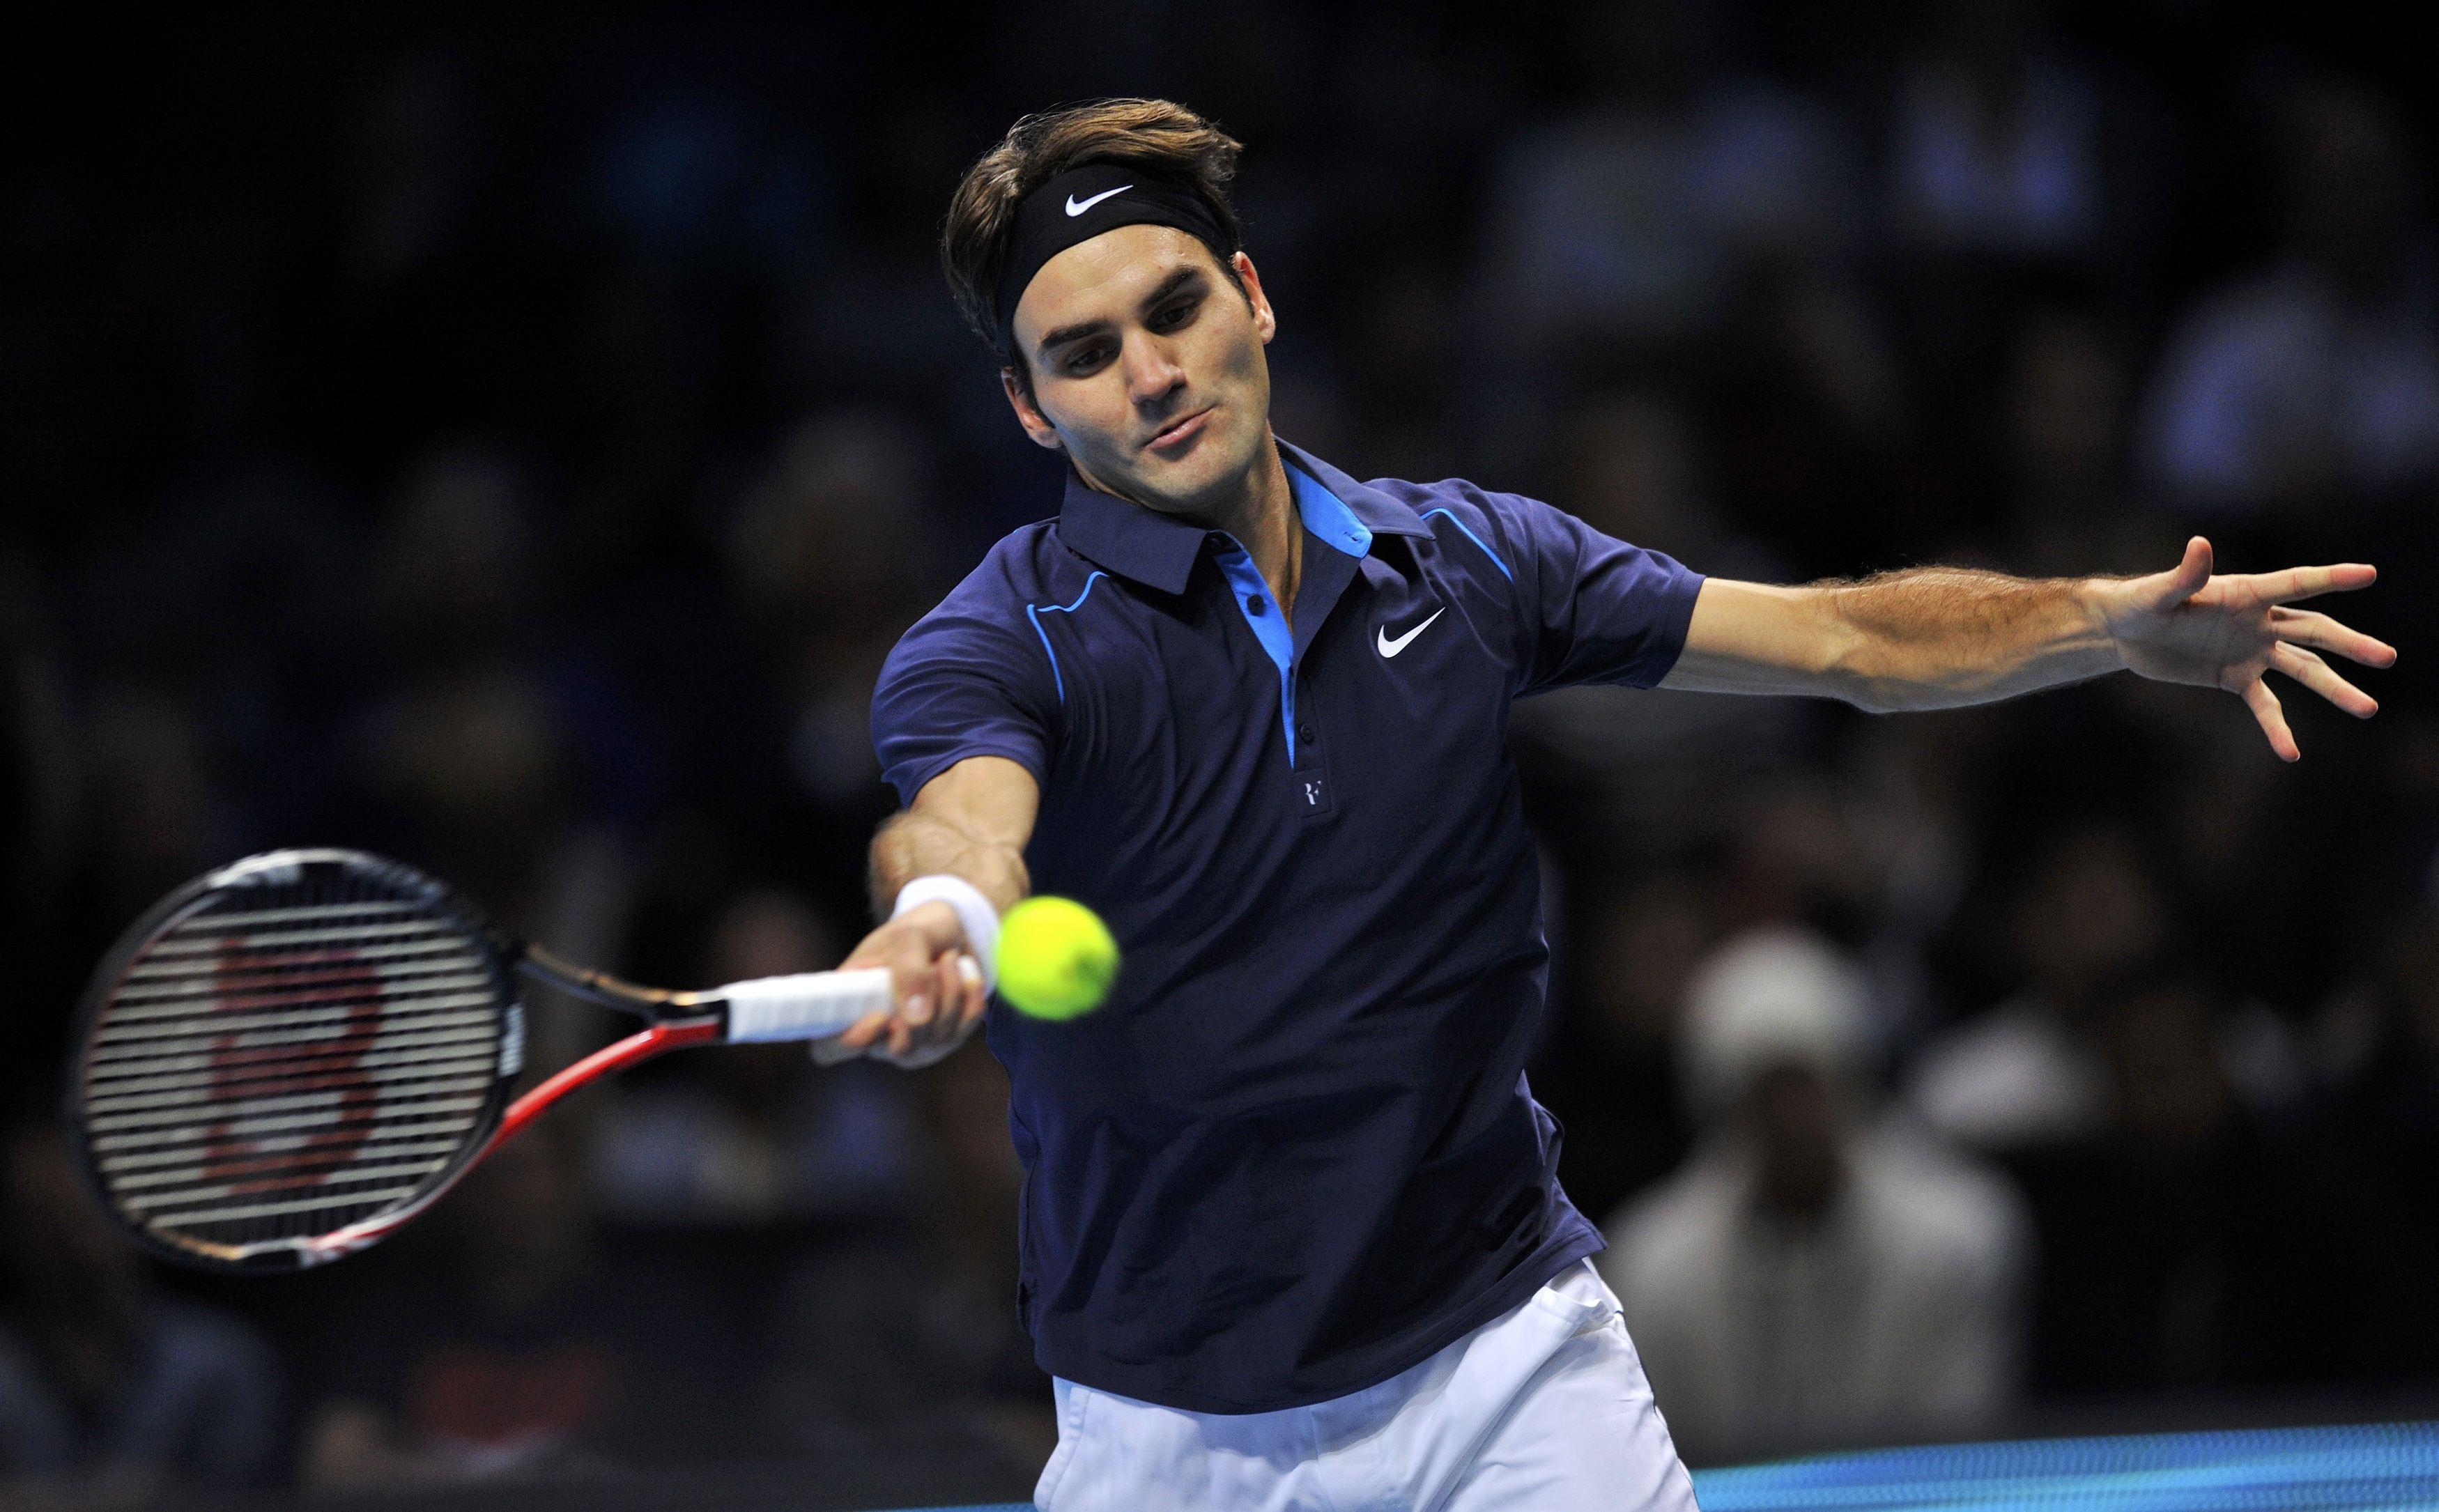 Roger Federer Wallpapers Wallpaper Cave